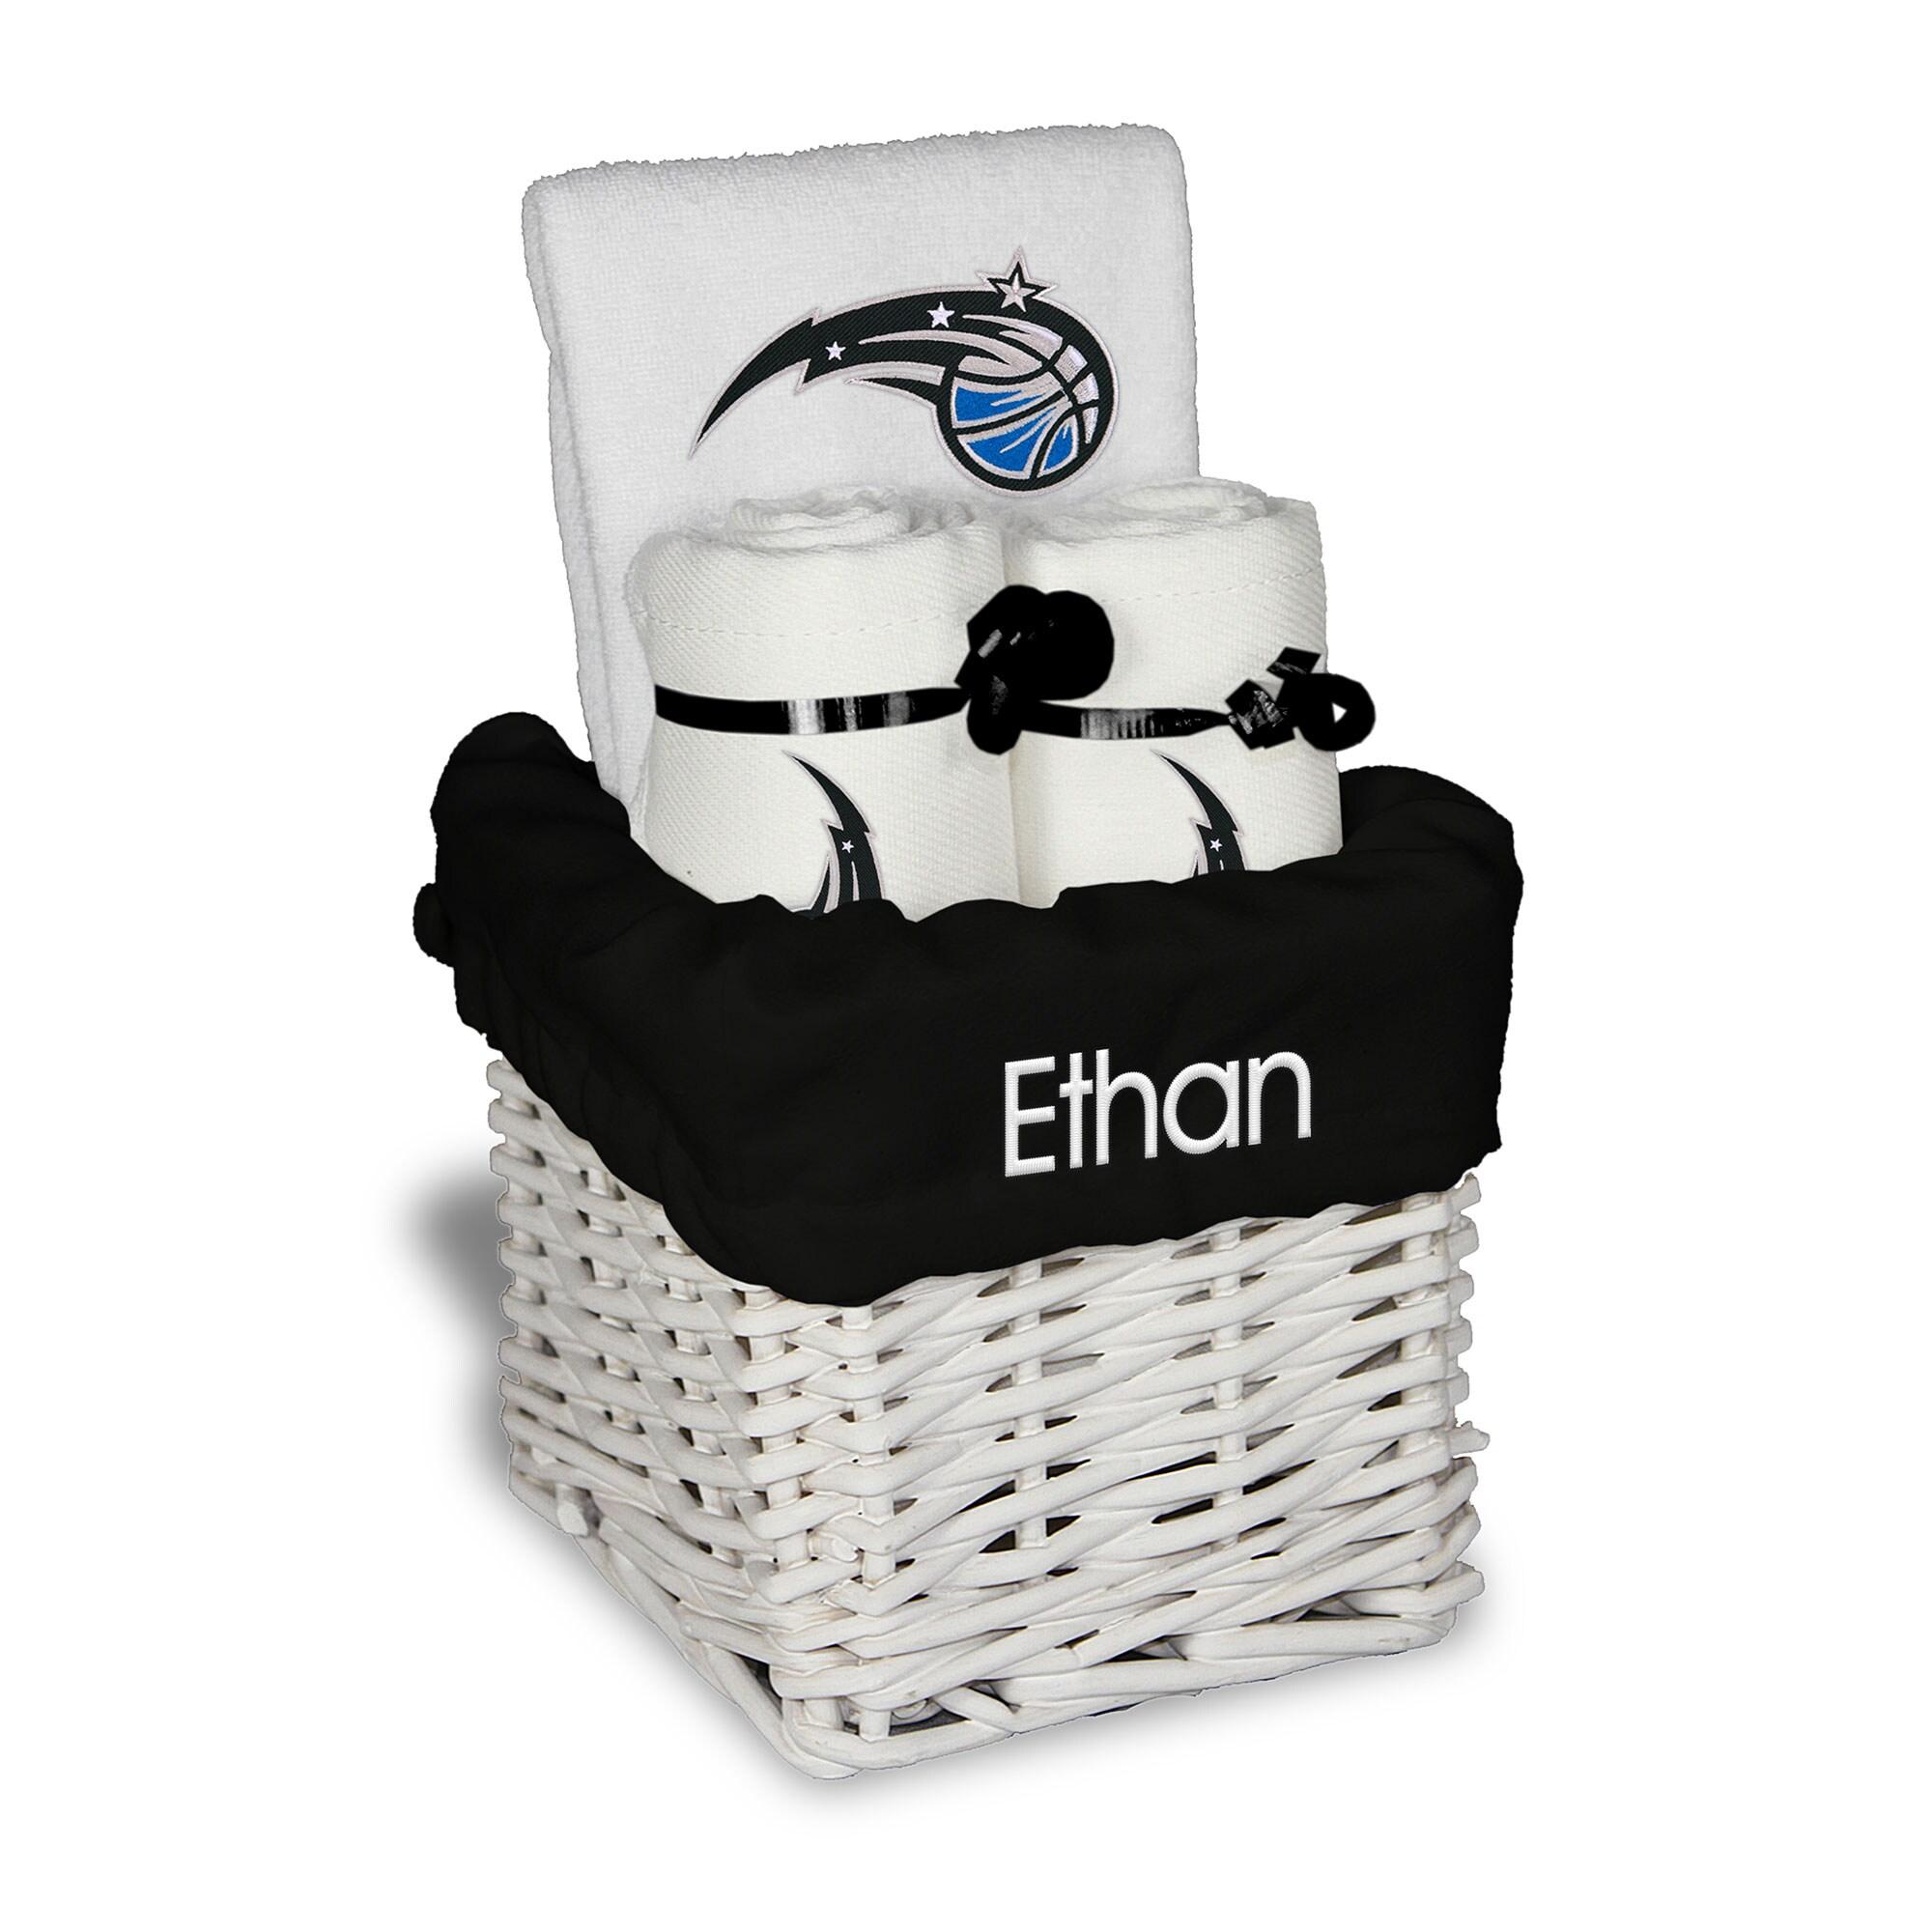 Orlando Magic Personalized Small Gift Basket - White